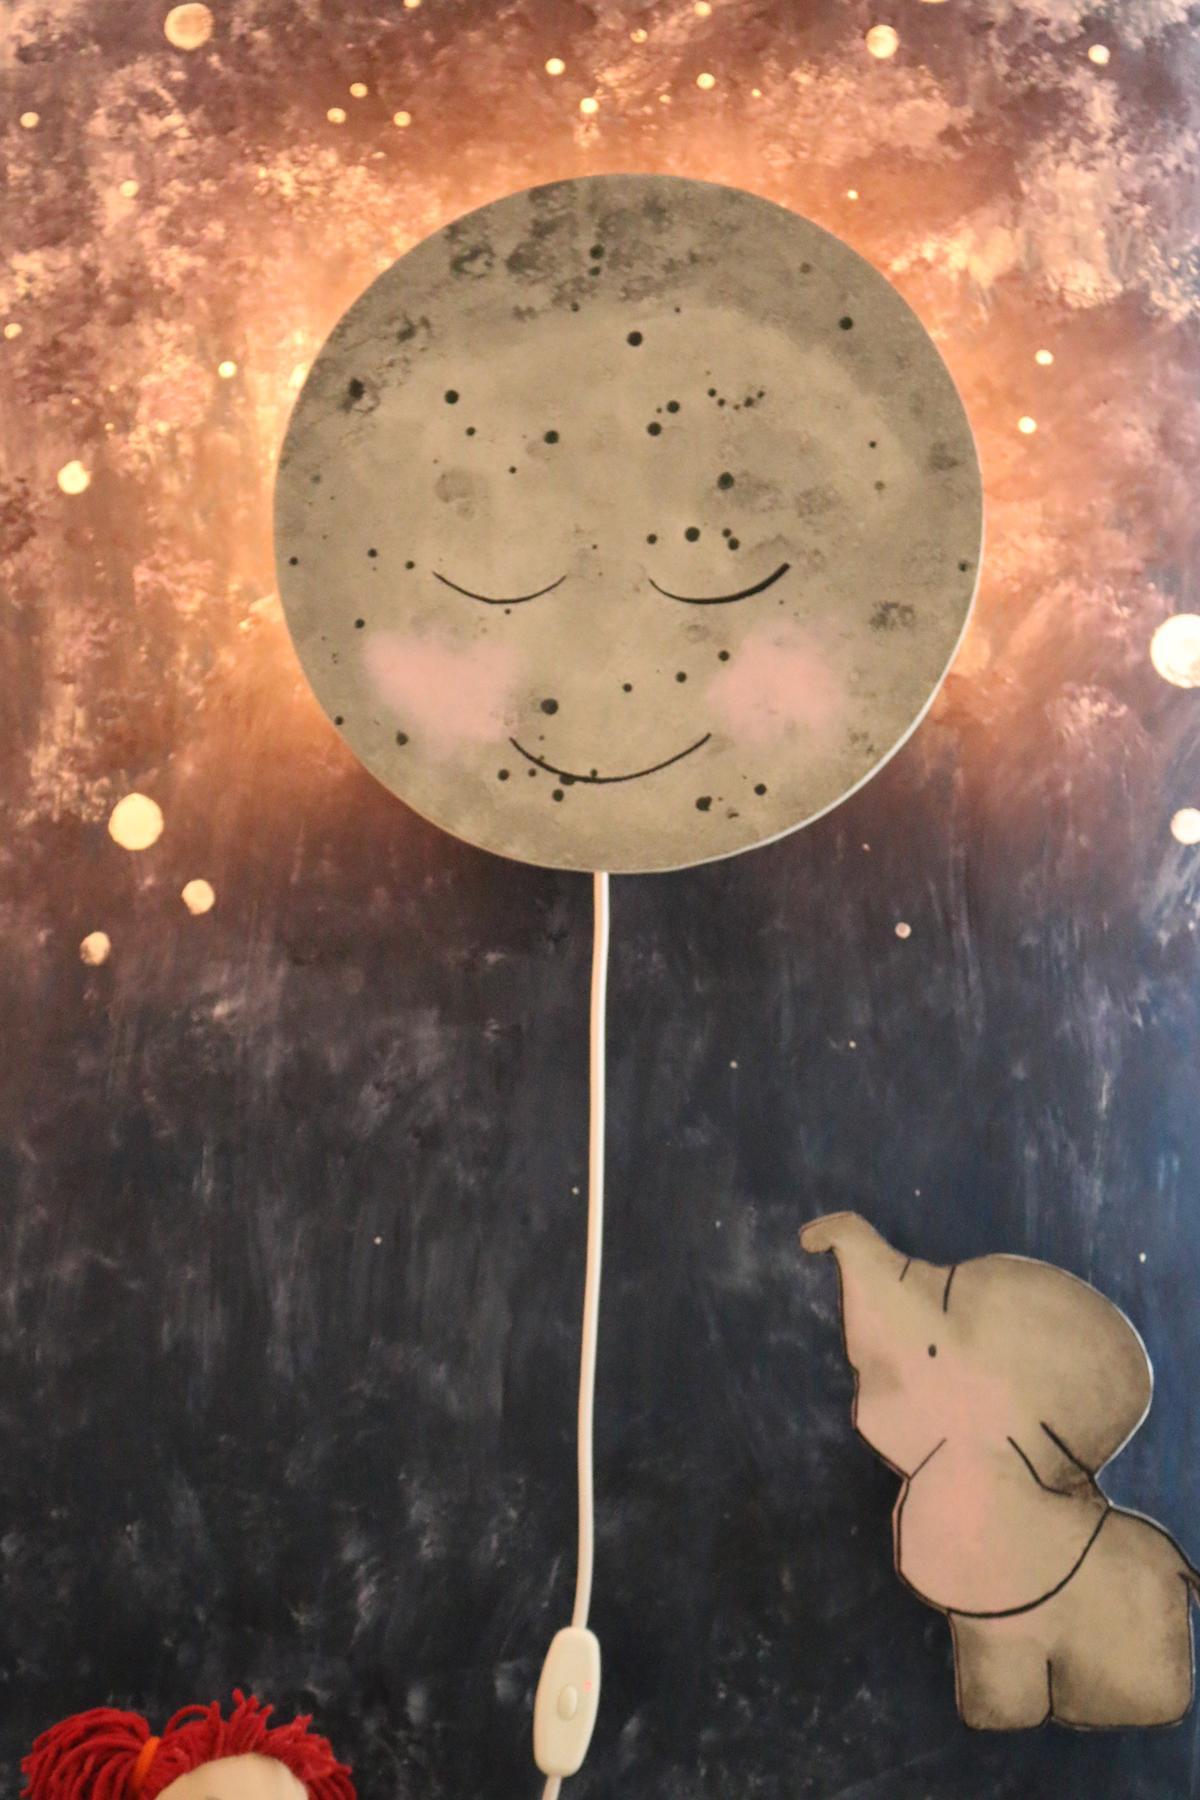 Mondlampe für Kinder selber bauen diy